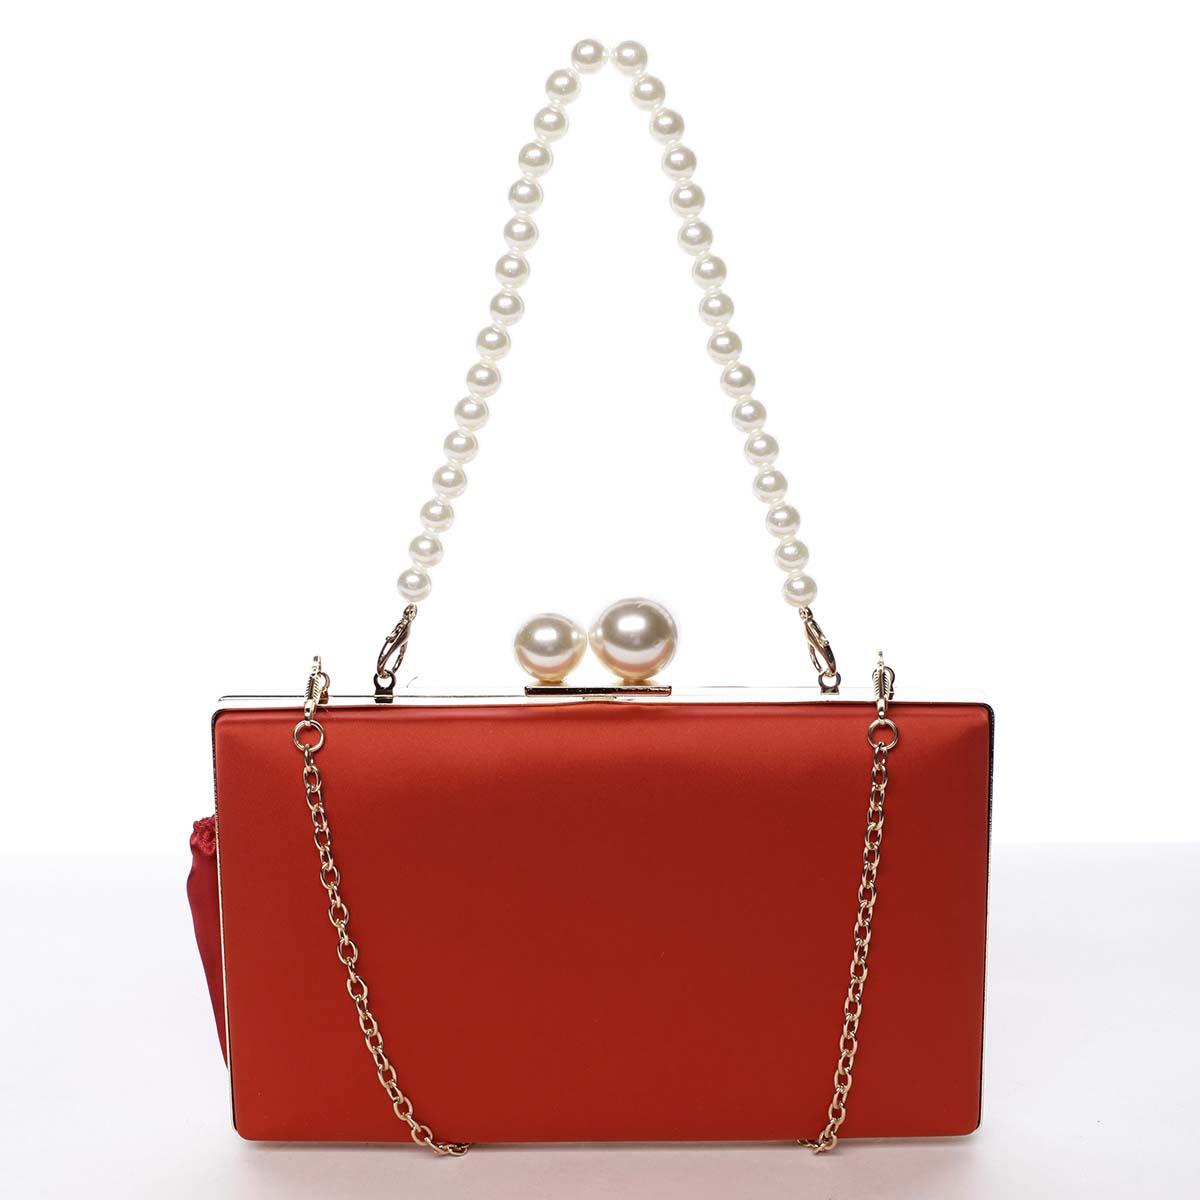 Luxusní dámské saténové psaníčko s perlami červené - Michelle Moon Seeland